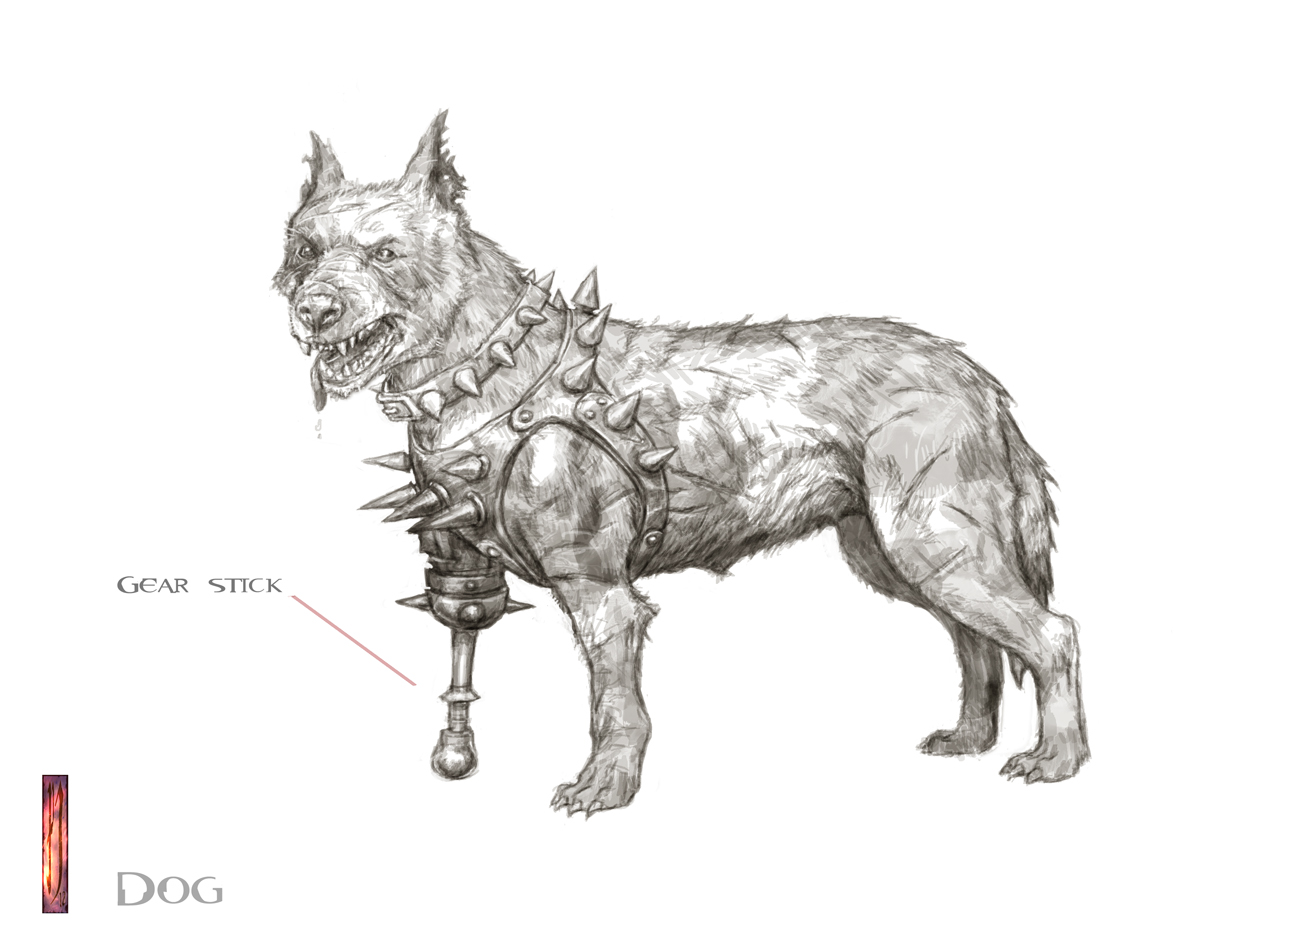 Dog version 1